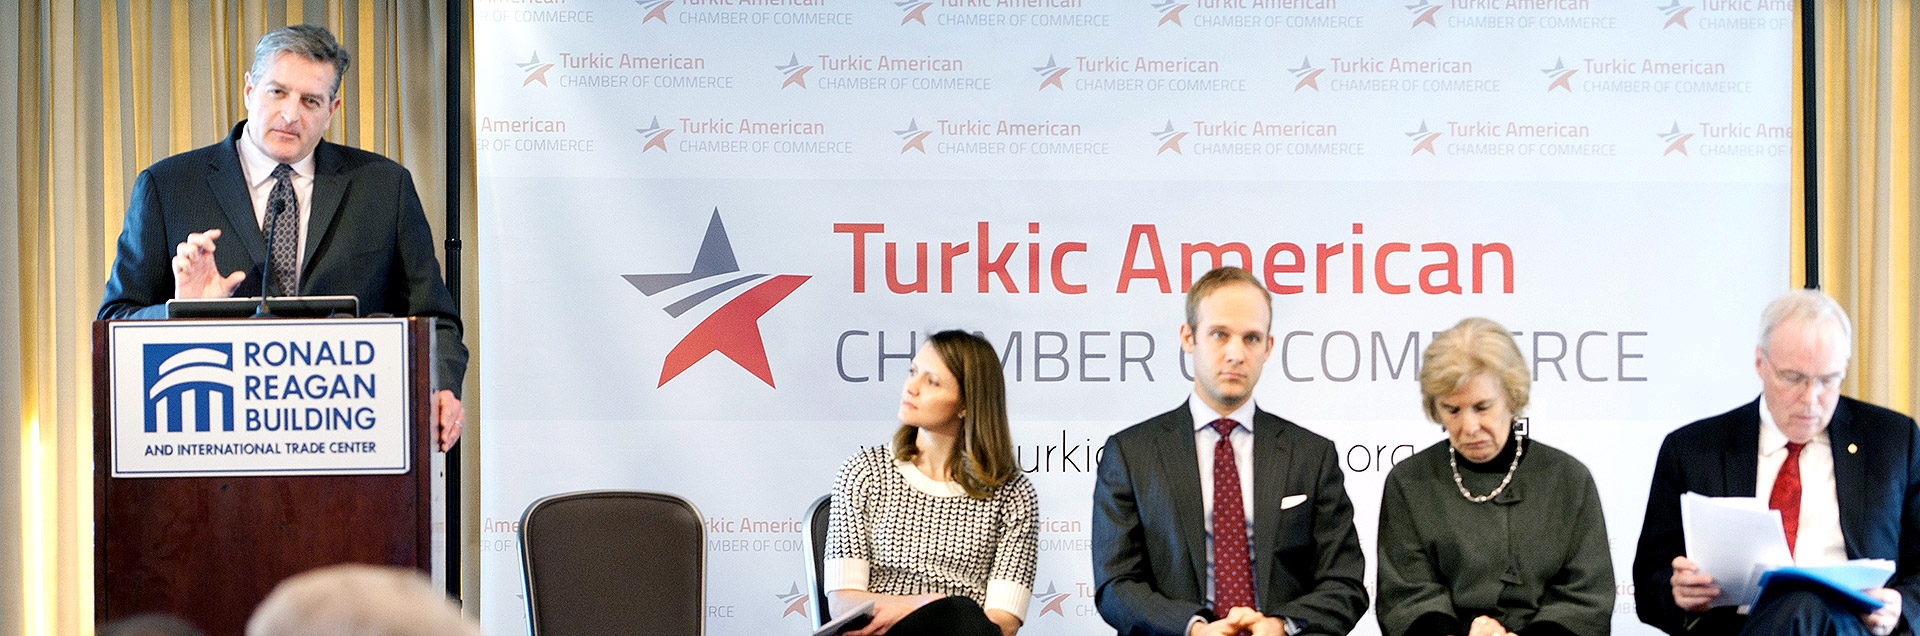 Turkic American Business Breakfast Meeting 2015